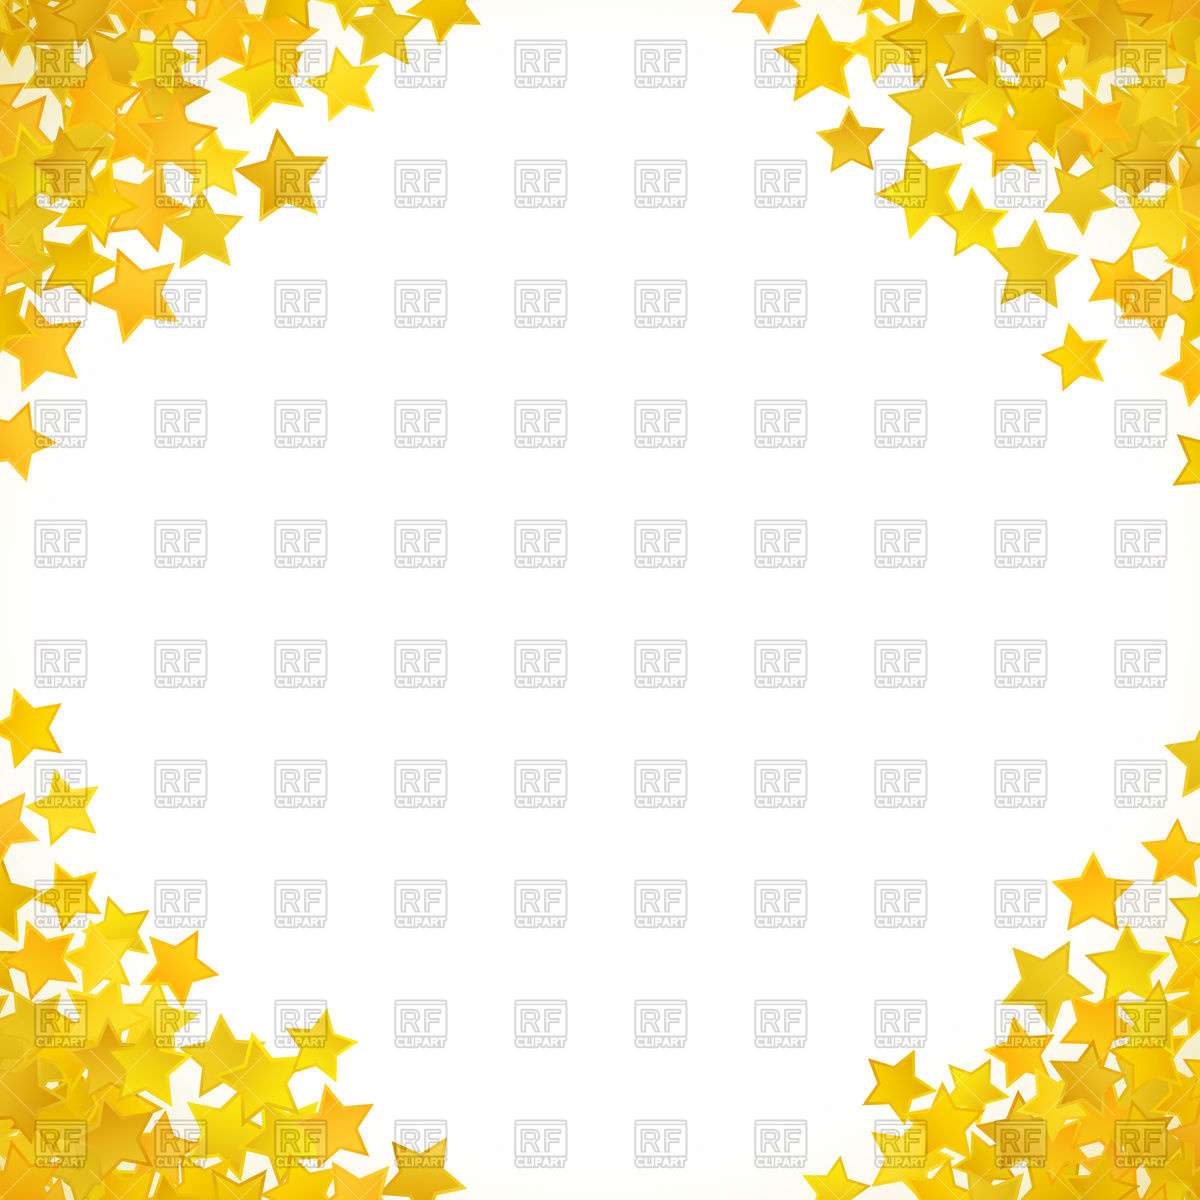 1200x1200 Abstract Yellow Star Border Vector Image Vector Artwork Of